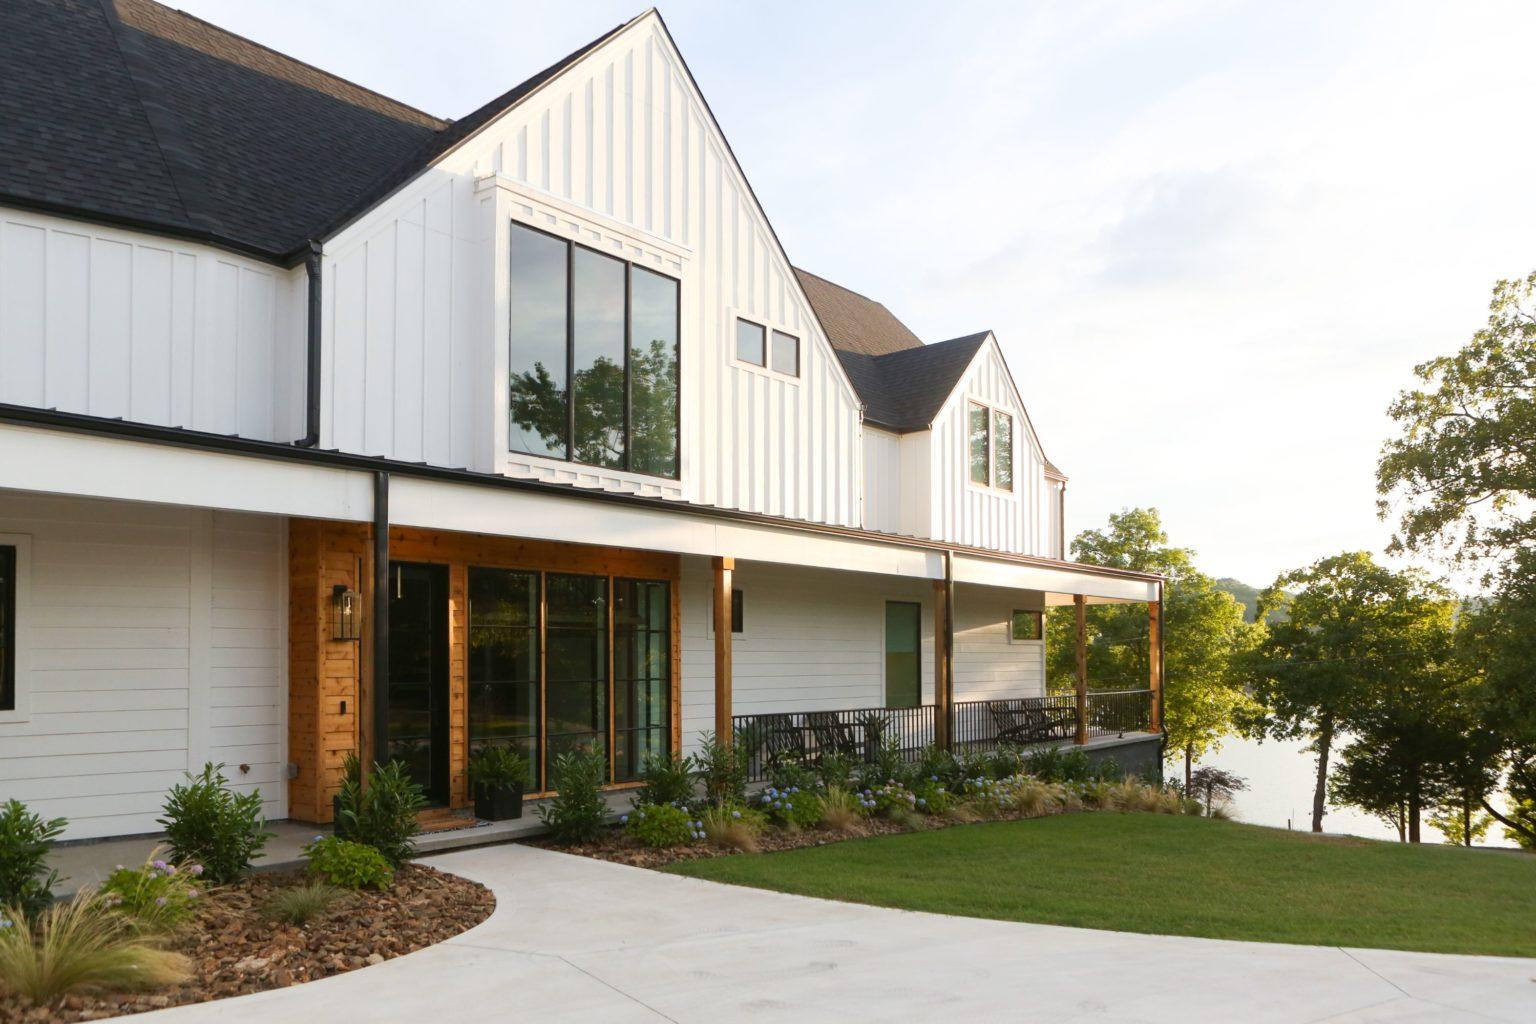 Modern Farmhouse Lake House - Beaver lake project